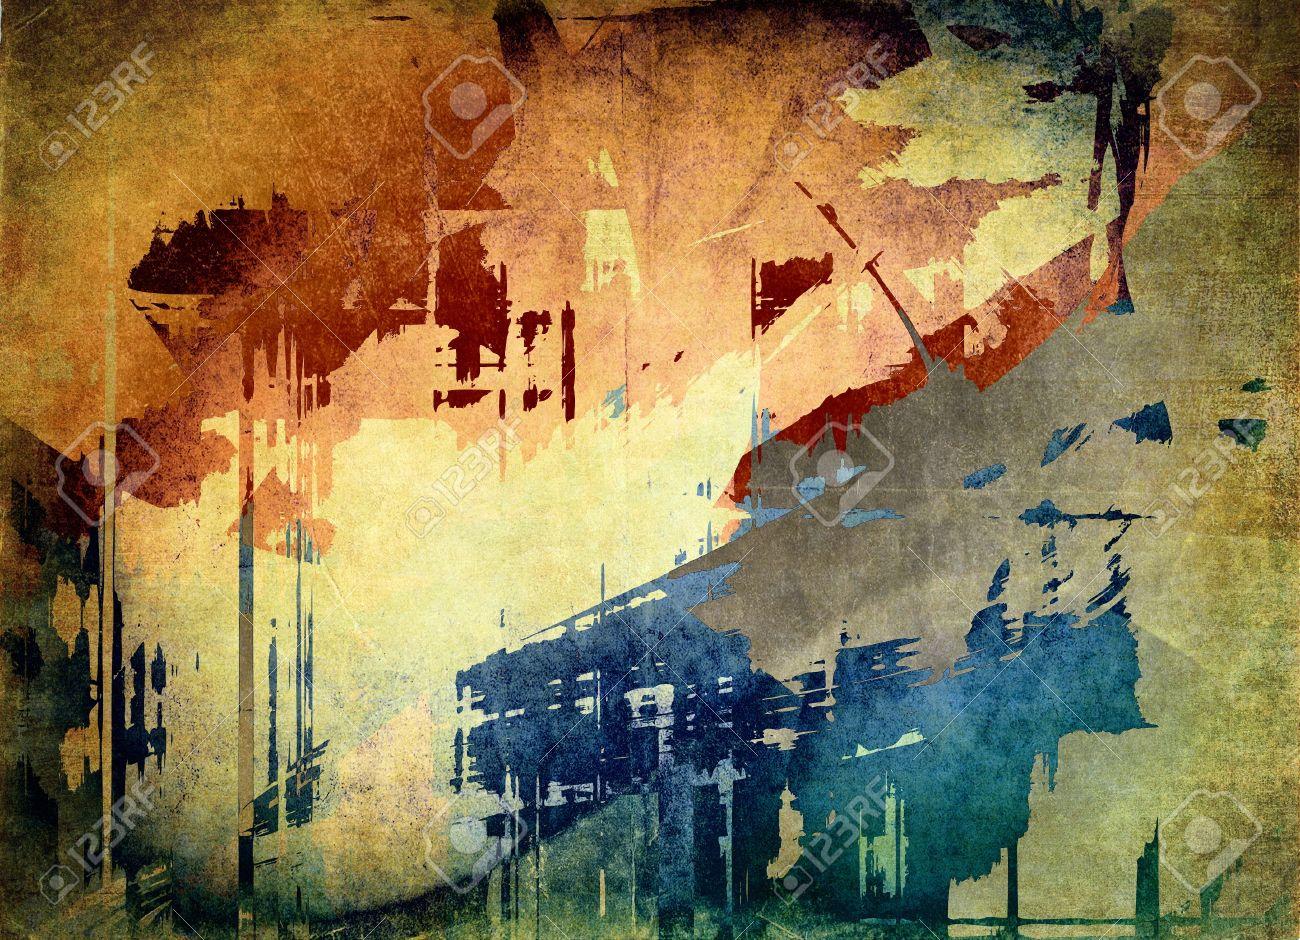 Nice wallpapers Grunge Art 1300x940px